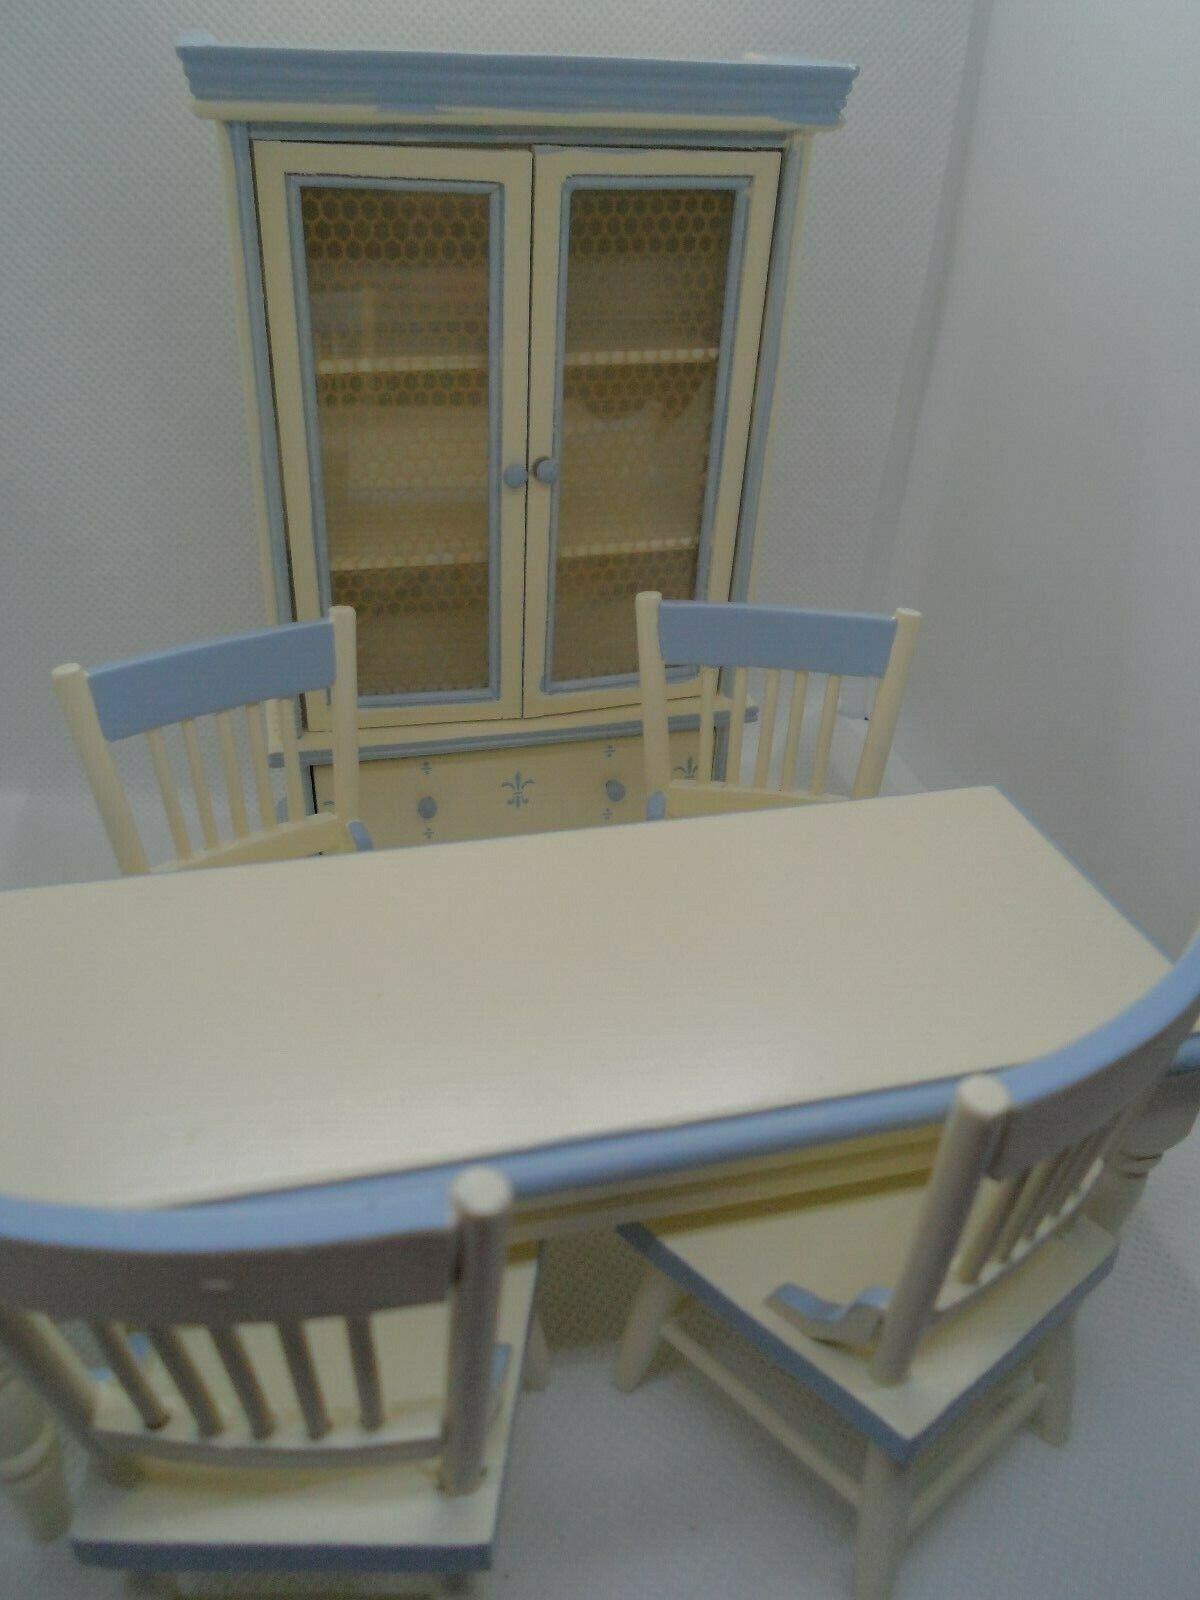 6-teiliges Esszimmer mit Vitrine Creme-Blau 1 12 Puppenhaus Miniatur Puppenstube